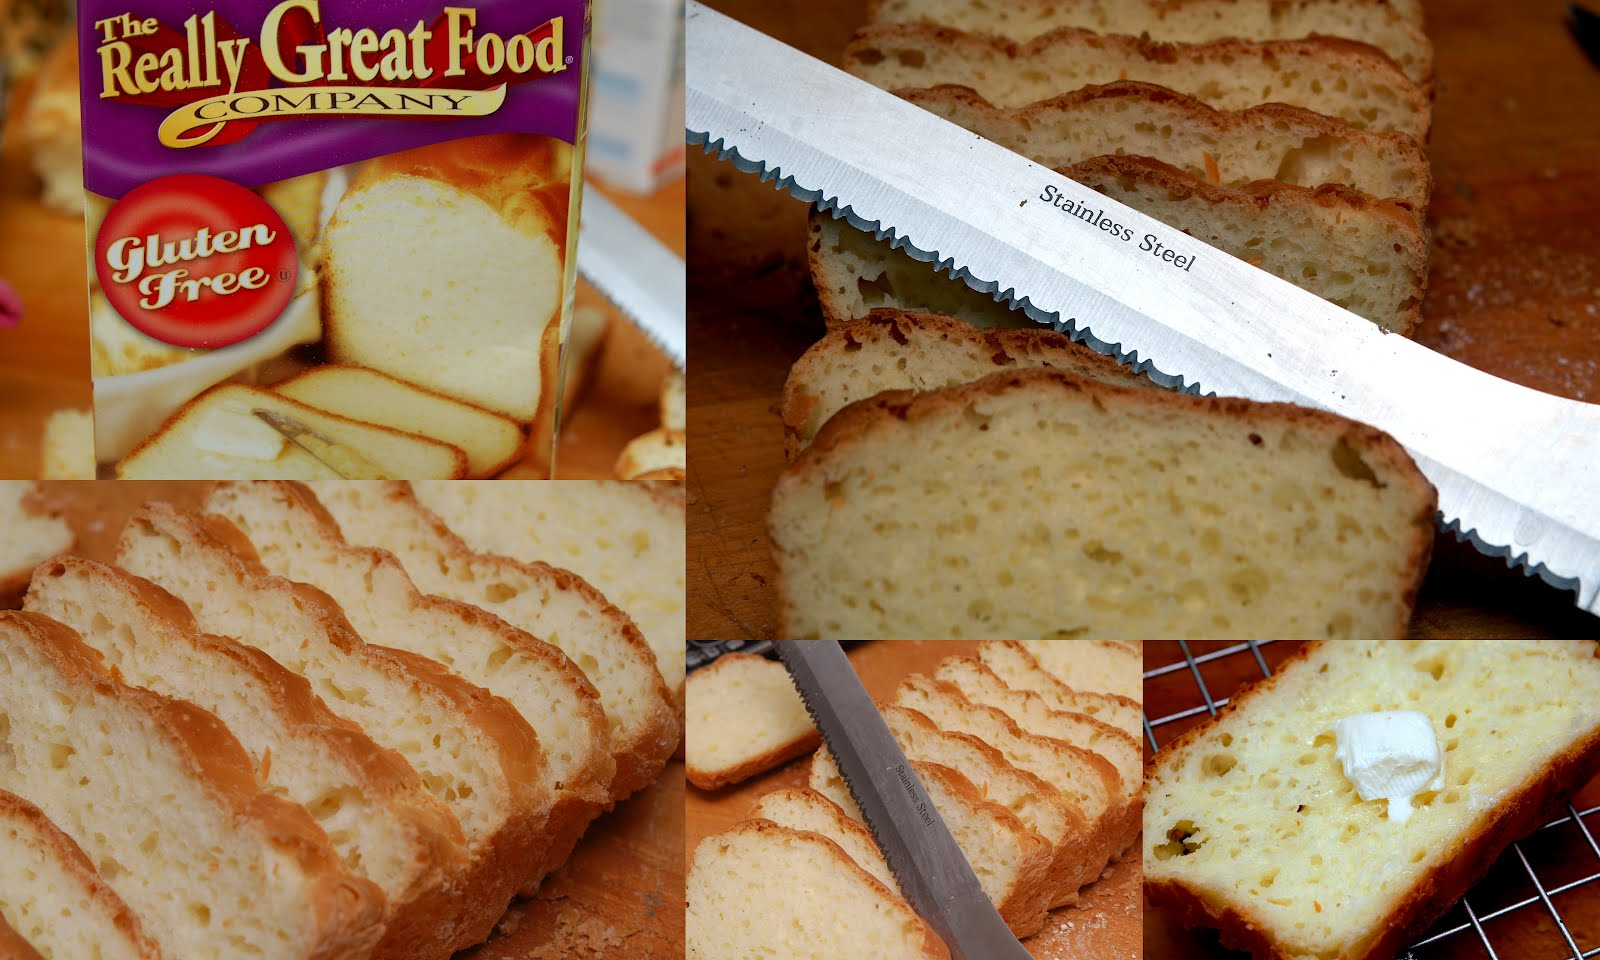 GLUTEN FREE HUGS & COOKIES XO: DELICIOUS GLUTEN FREE BREAD!